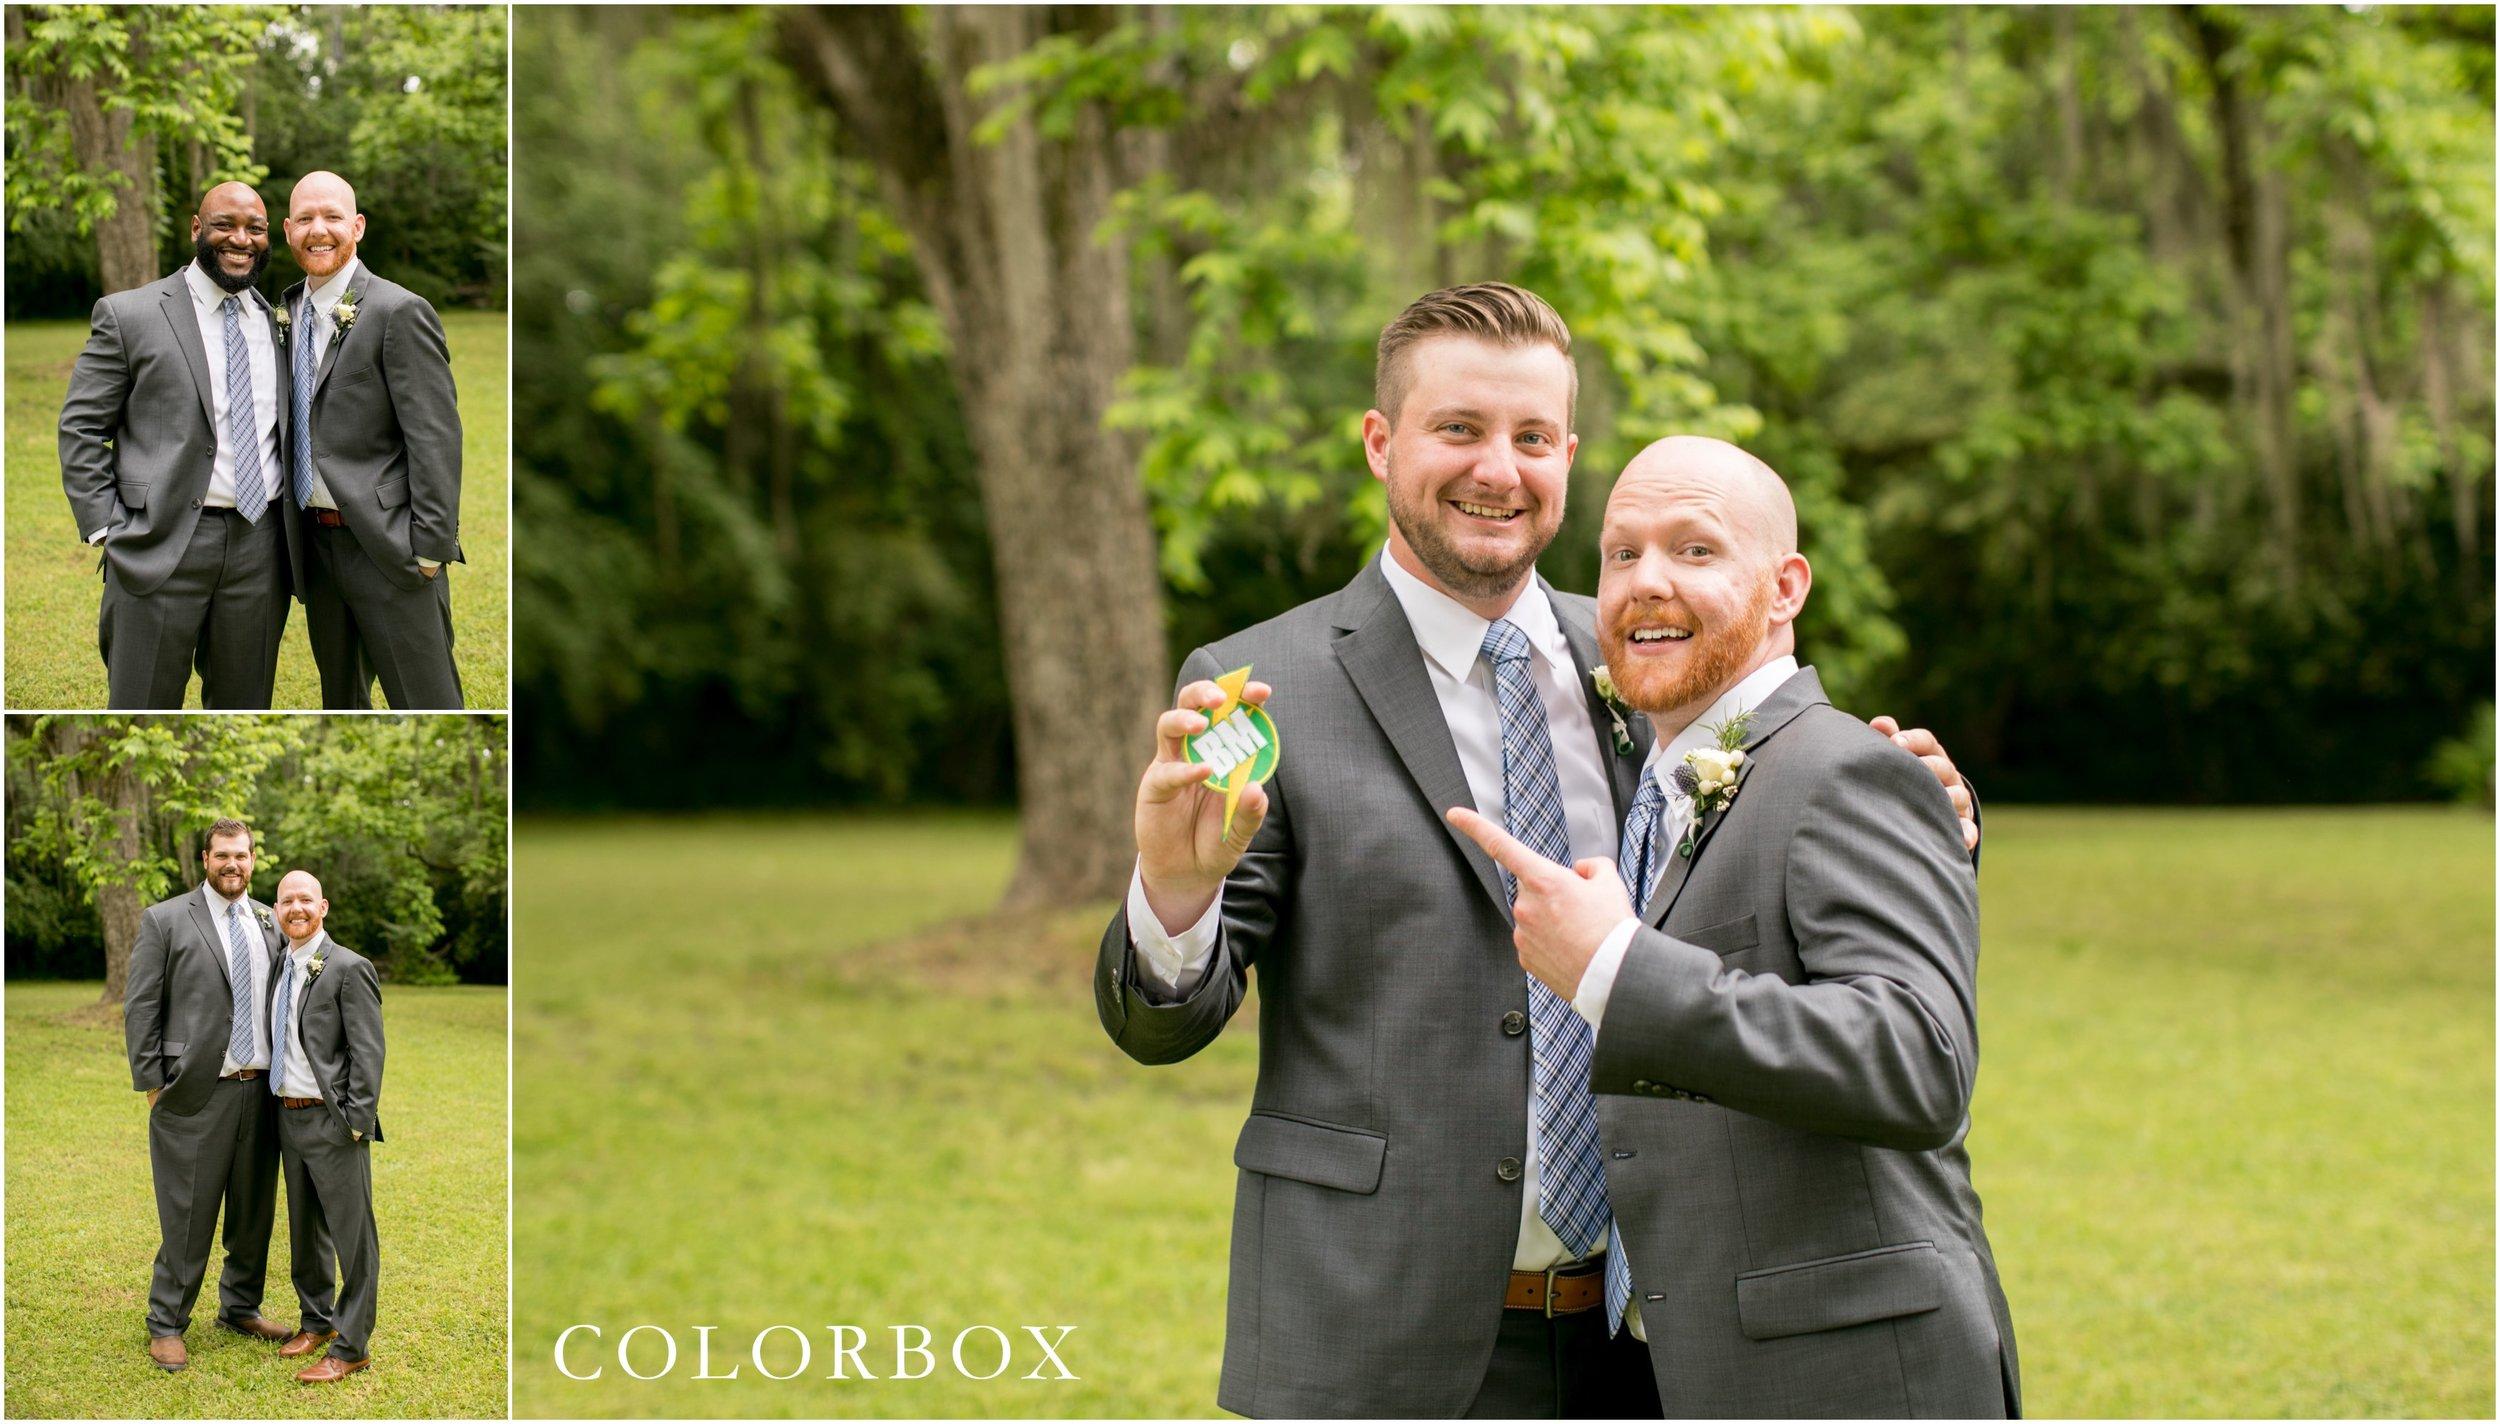 colorboxphotographers_5919.jpg